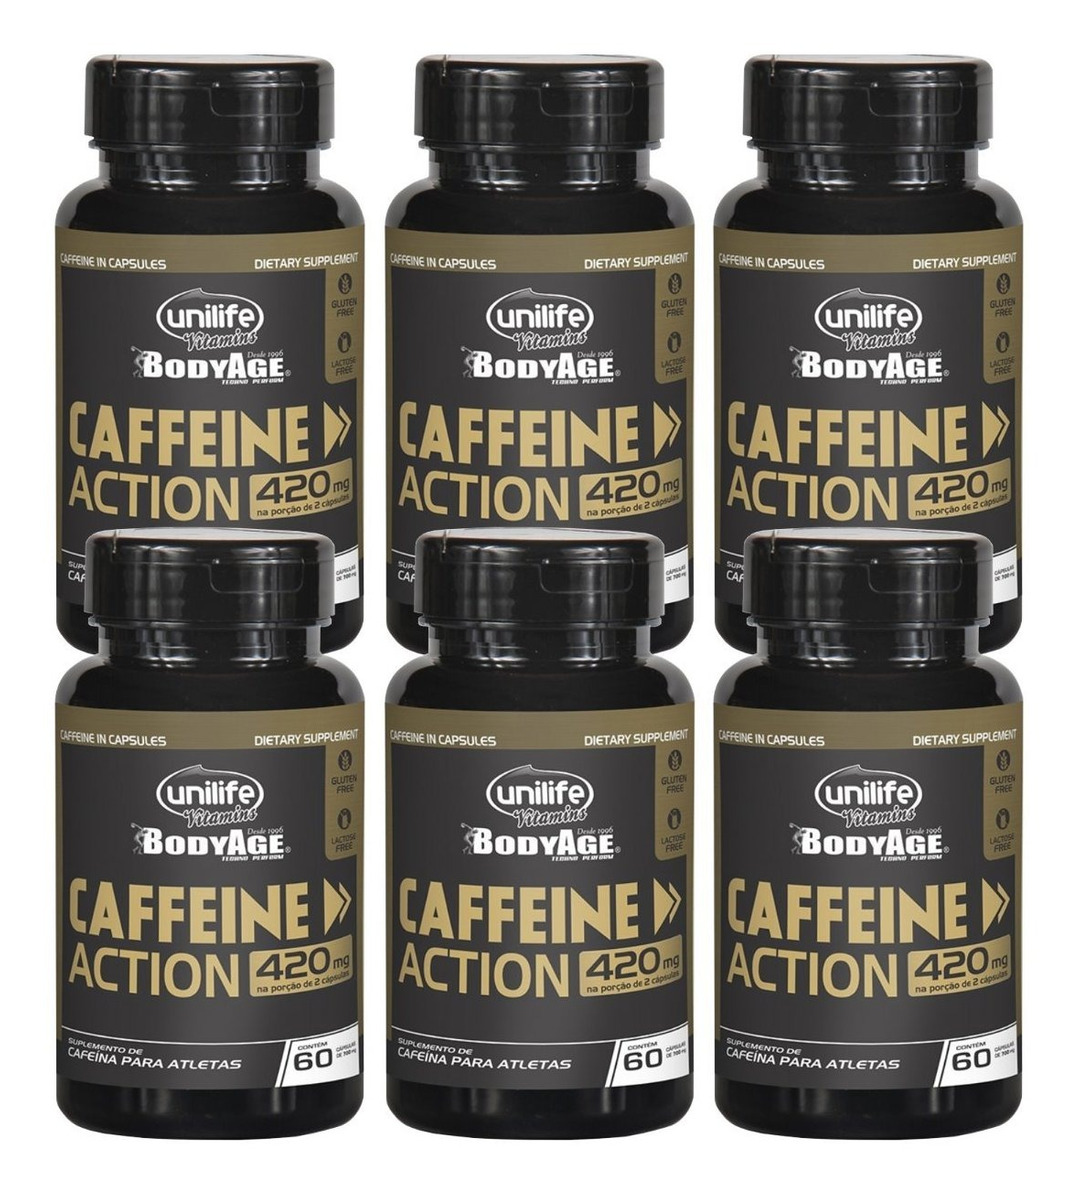 Cafeina Caffeine Action 60 Cápsulas 420mg Unilife Kit 6 Unidades